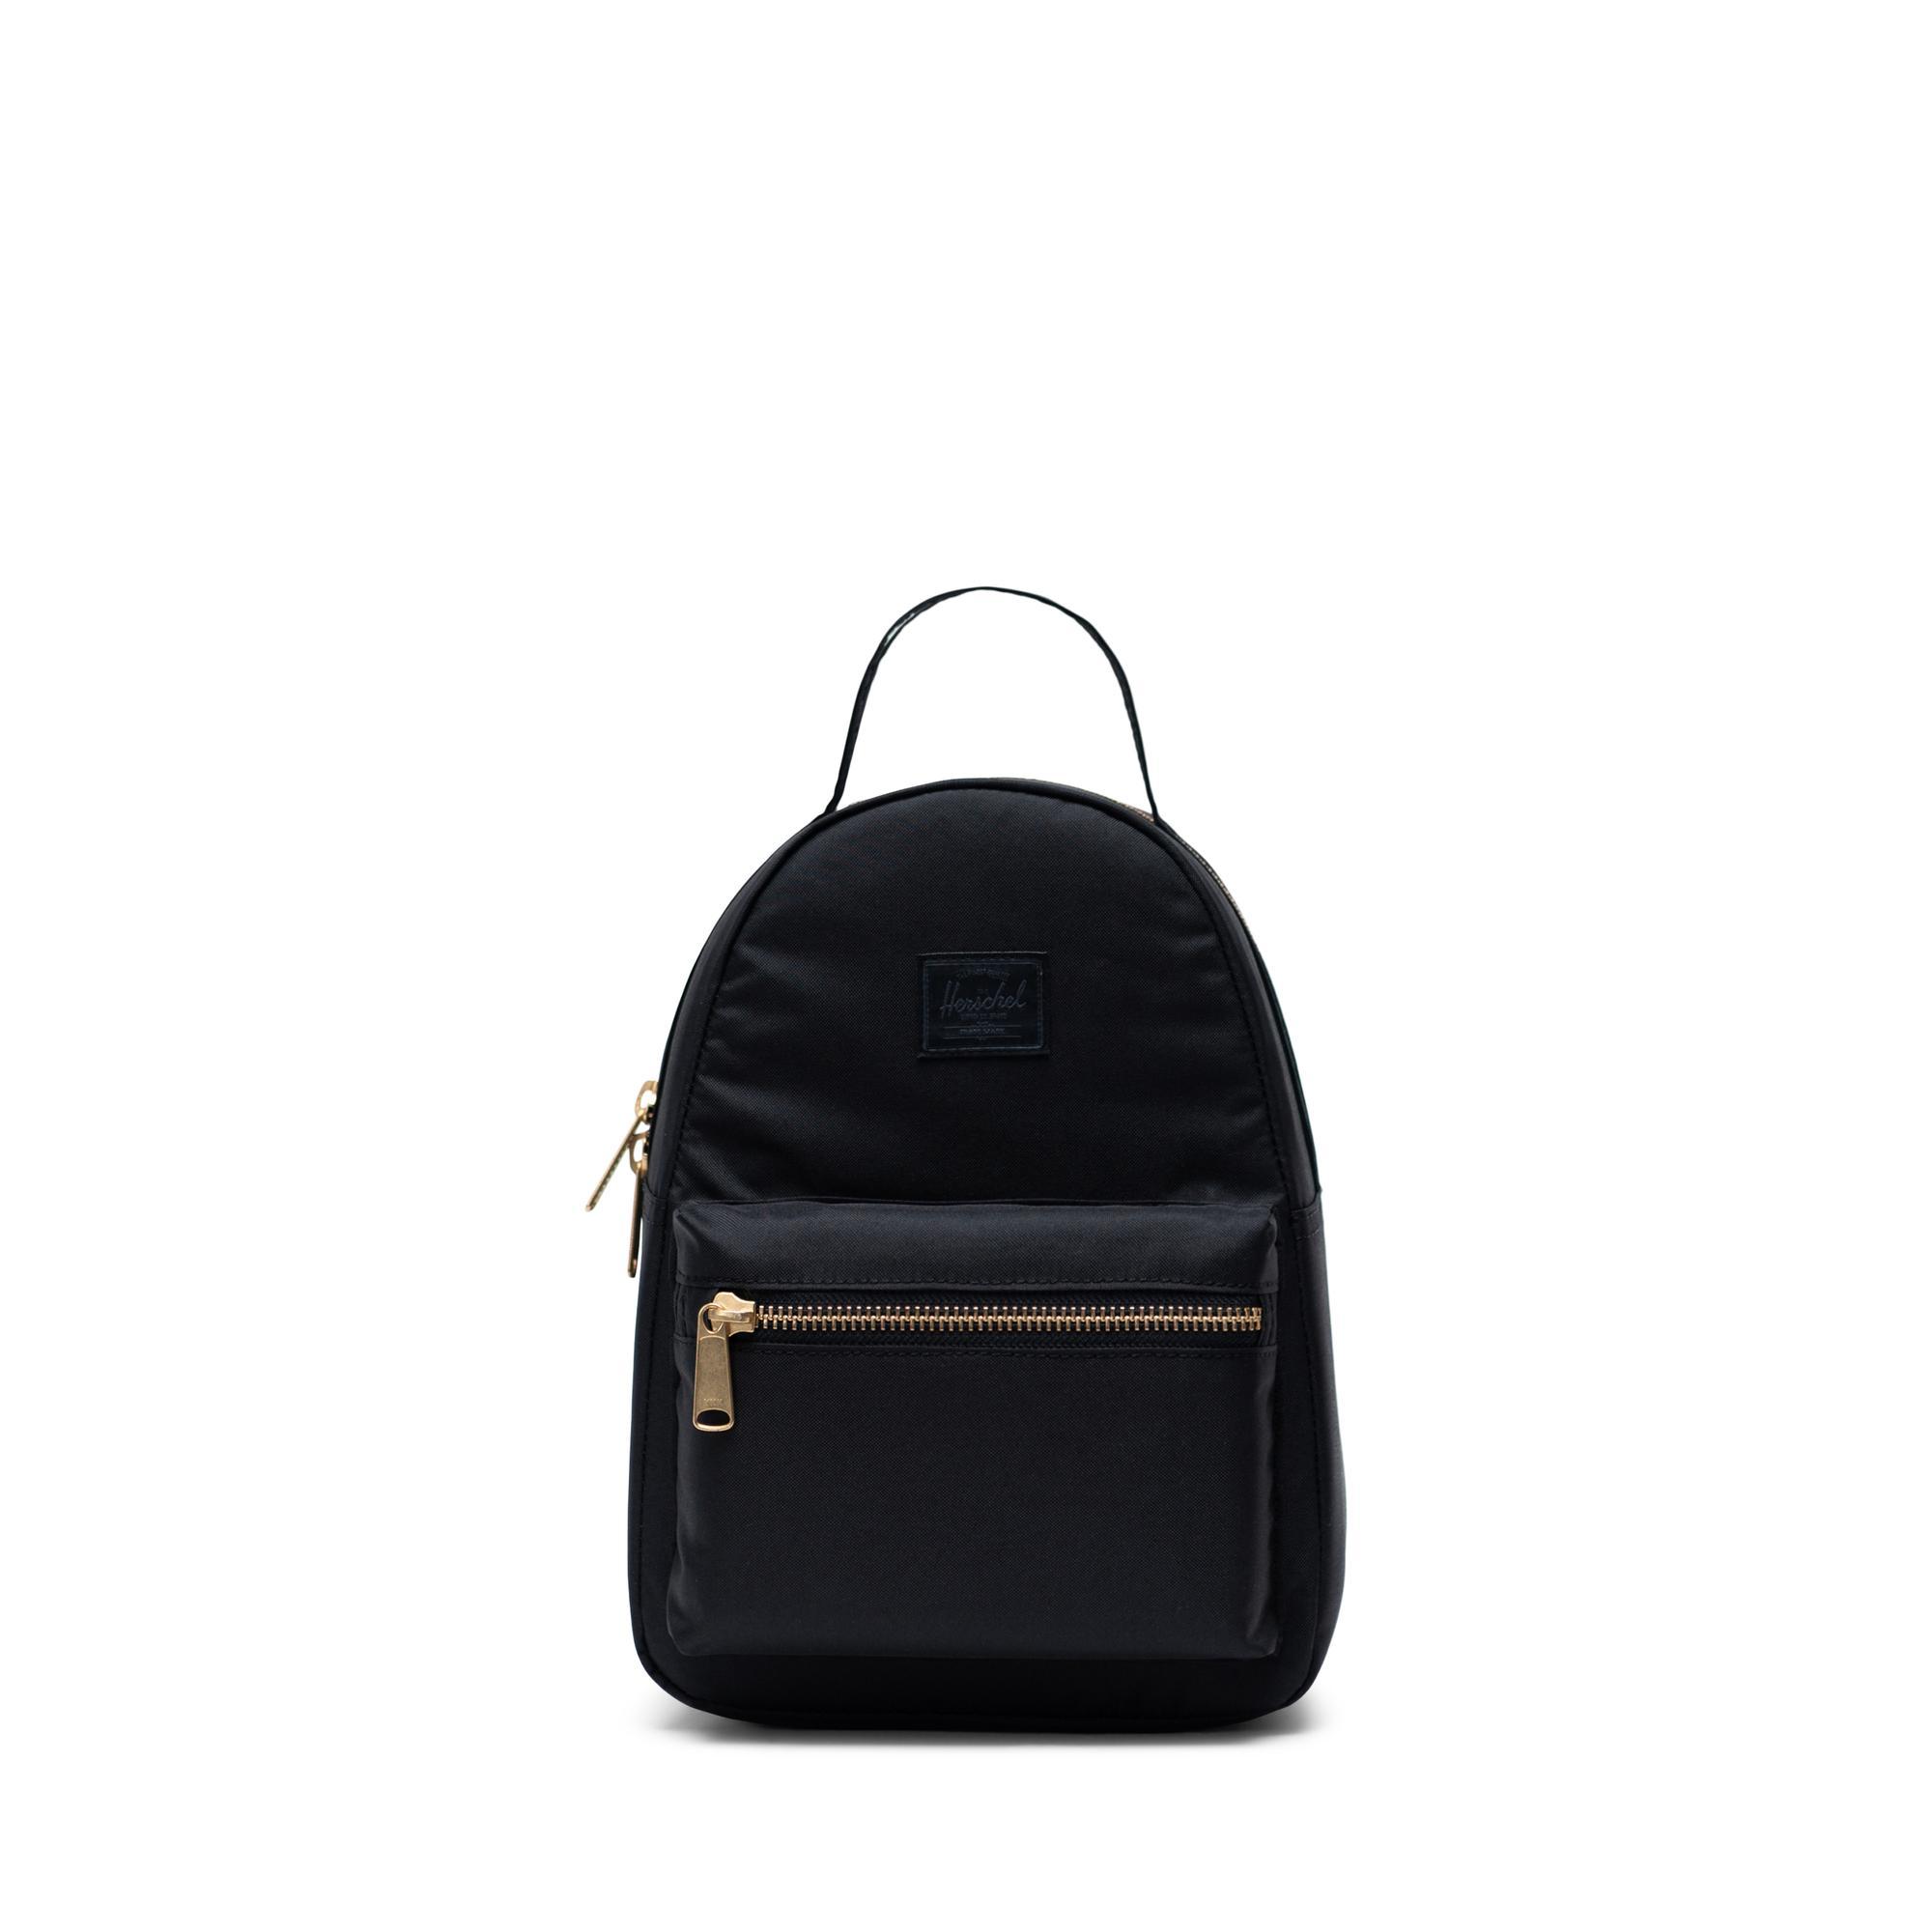 0817c8d4775 Nova Backpack Mini Light